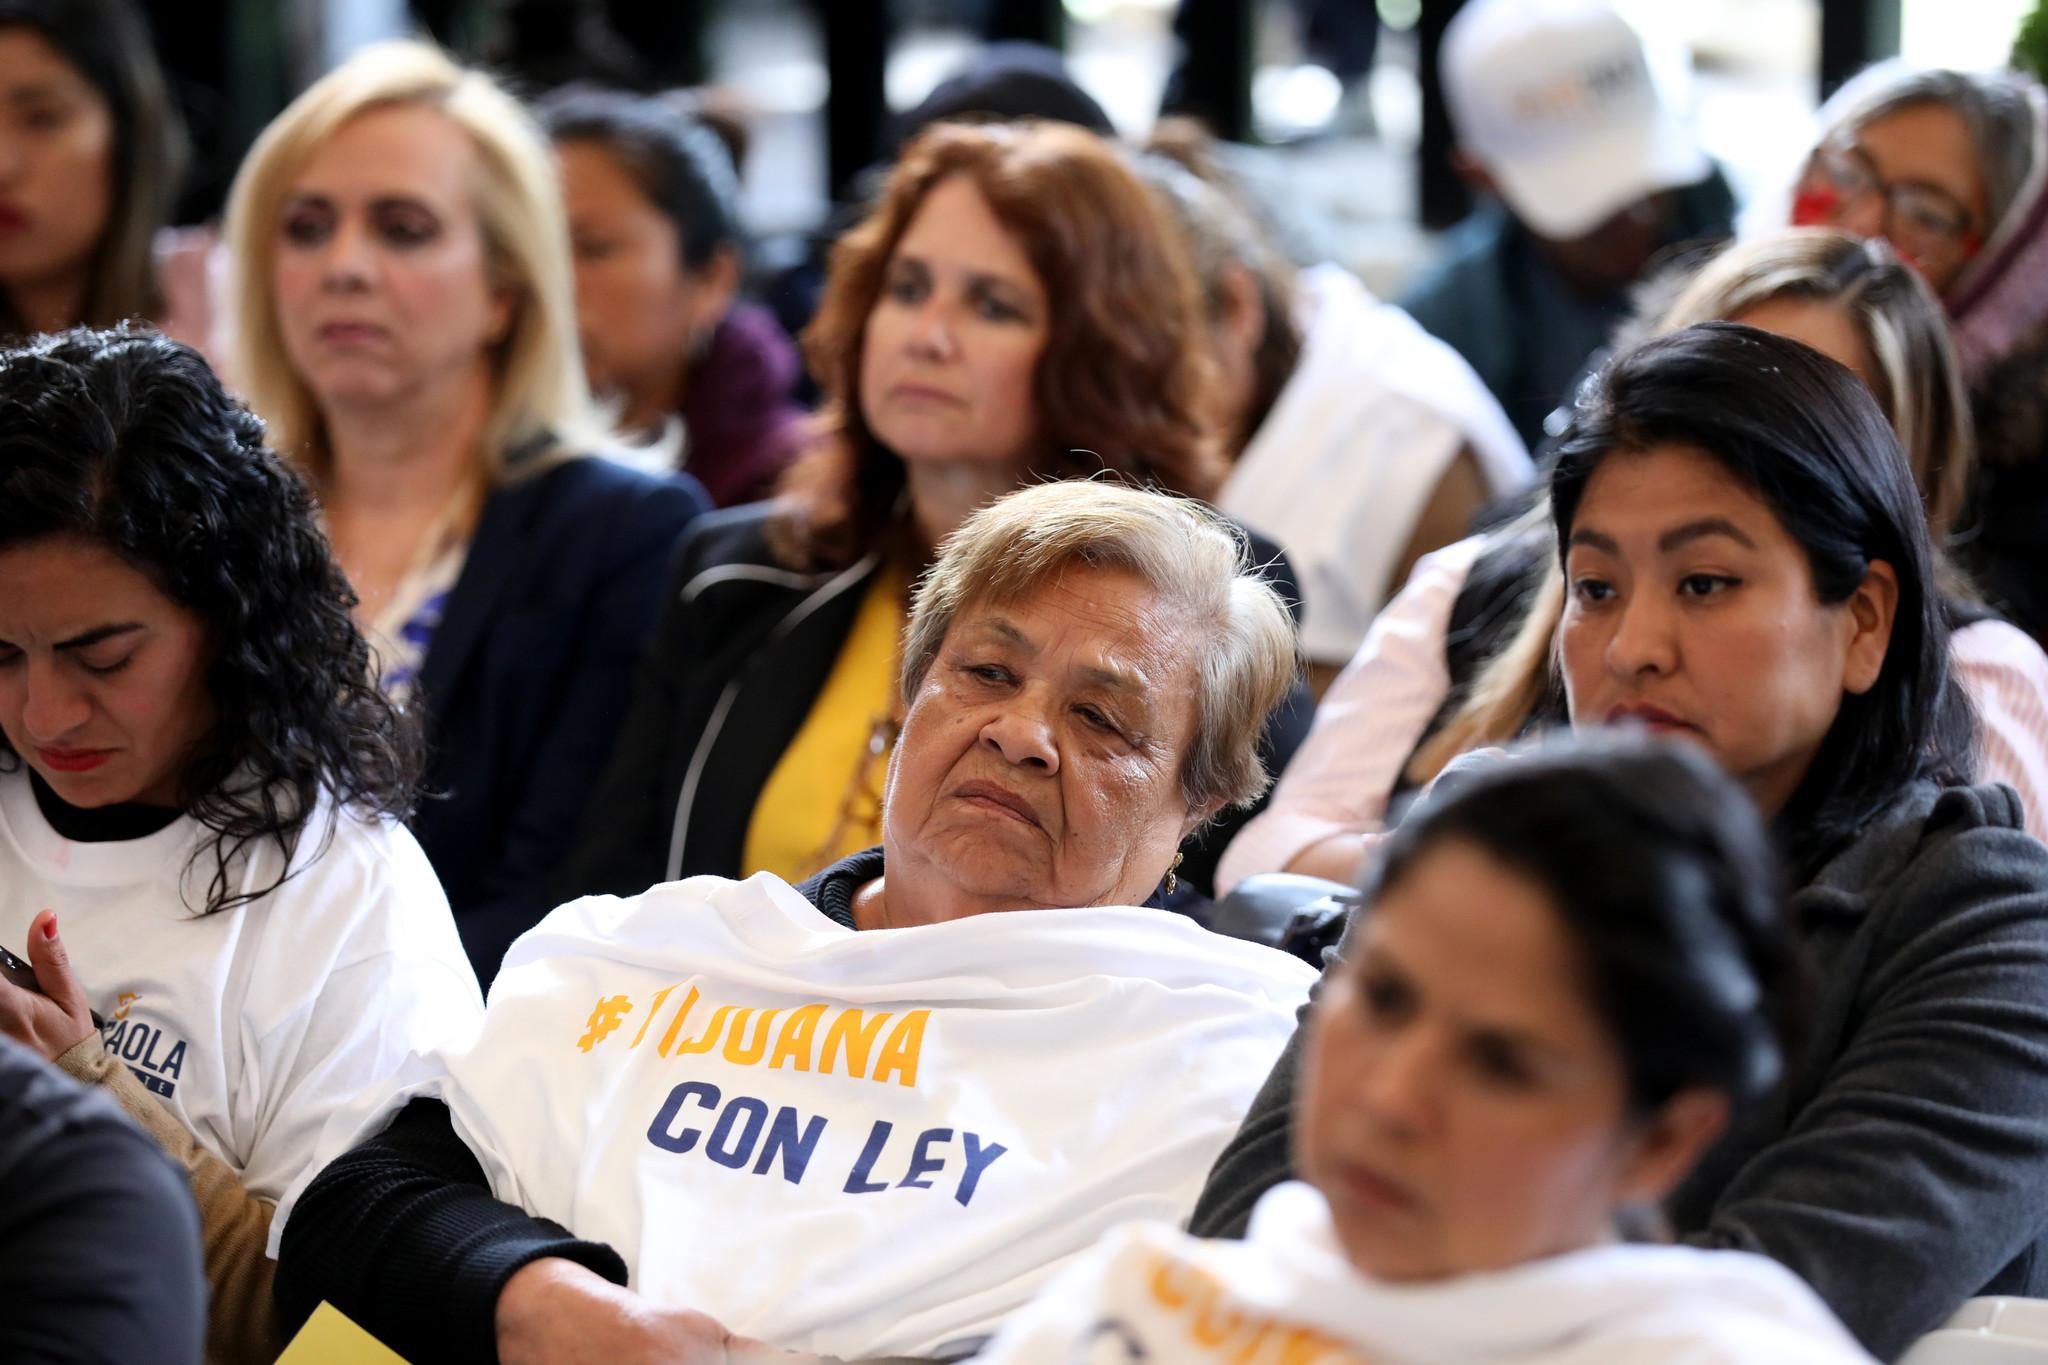 TIJUANA, BAJA CALIF. -- THURSDAY, MAY 16, 2019: Women attend a forum to listen to Juli‡n Leyzaola, P